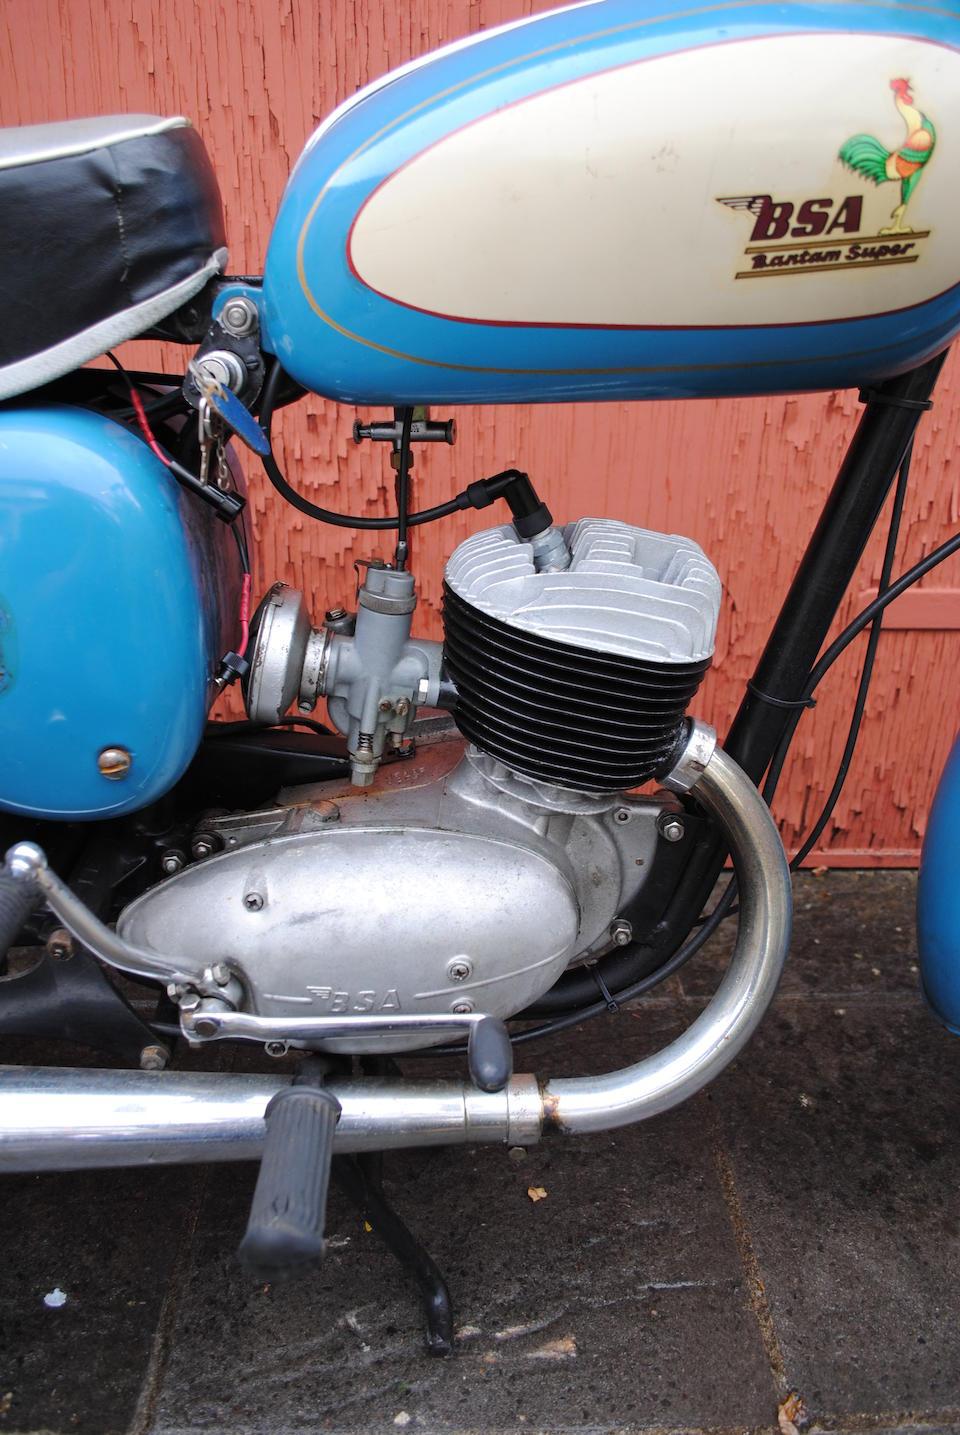 Property of a deceased's estate,1962 BSA 172cc D7 Bantam Super Frame no. to be advised Engine no. ED7B 26820